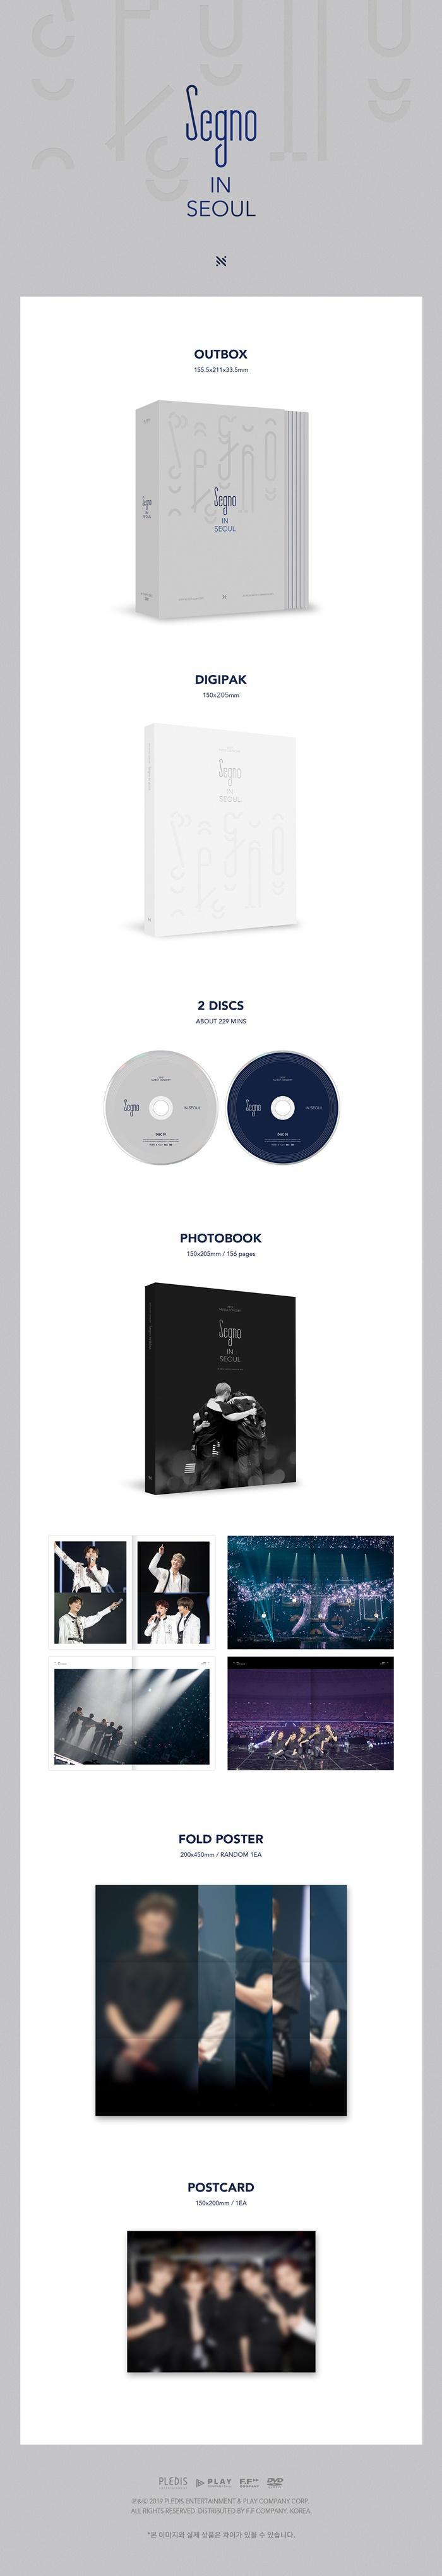 [DVD] NUEST - 2019 NUEST CONCERT [Segno] IN SEOUL DVD (2 DISC)